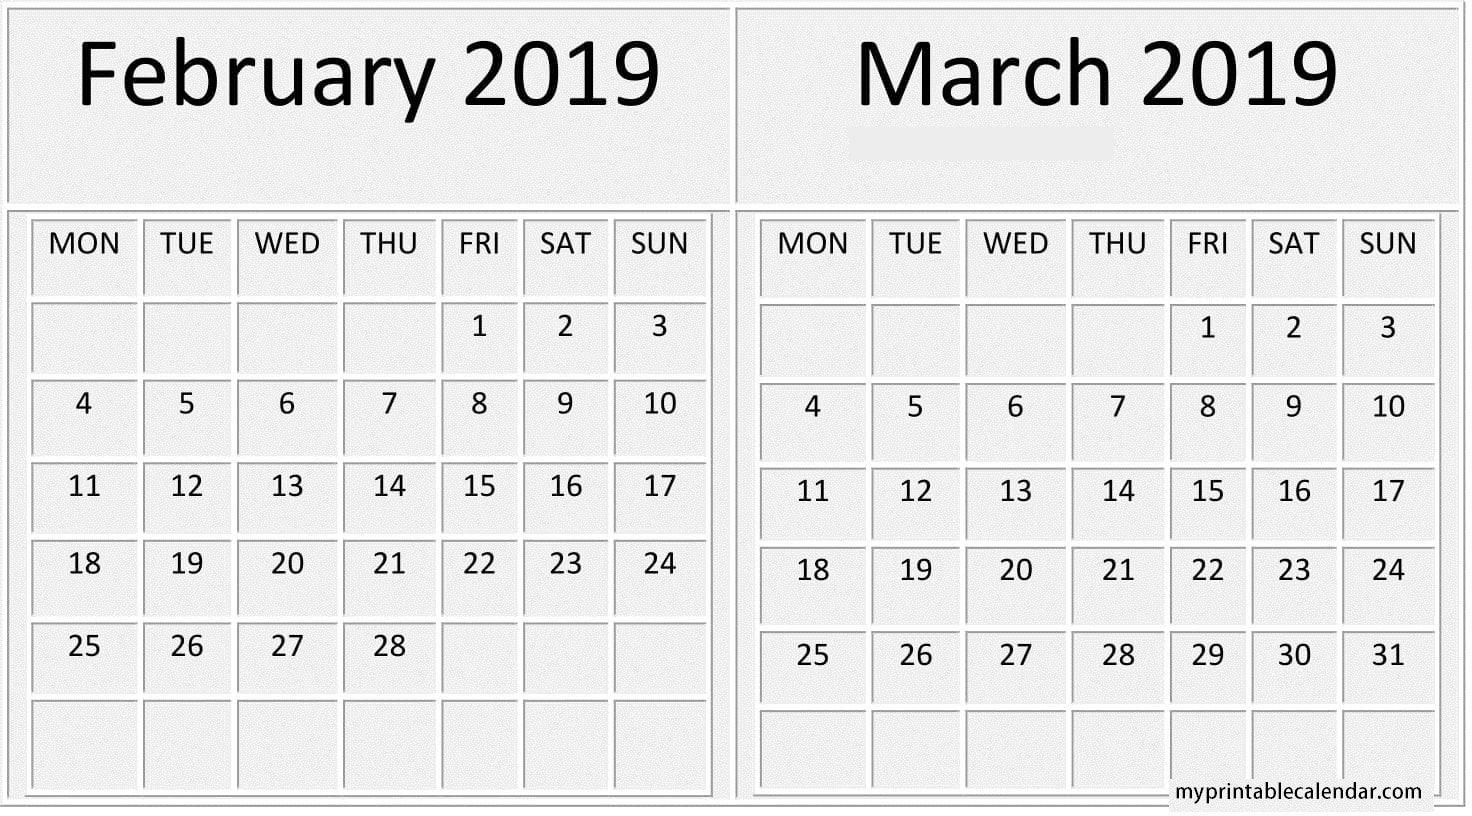 February March 2019 Calendar With Week Number | Calendar 2 Week Calendar March